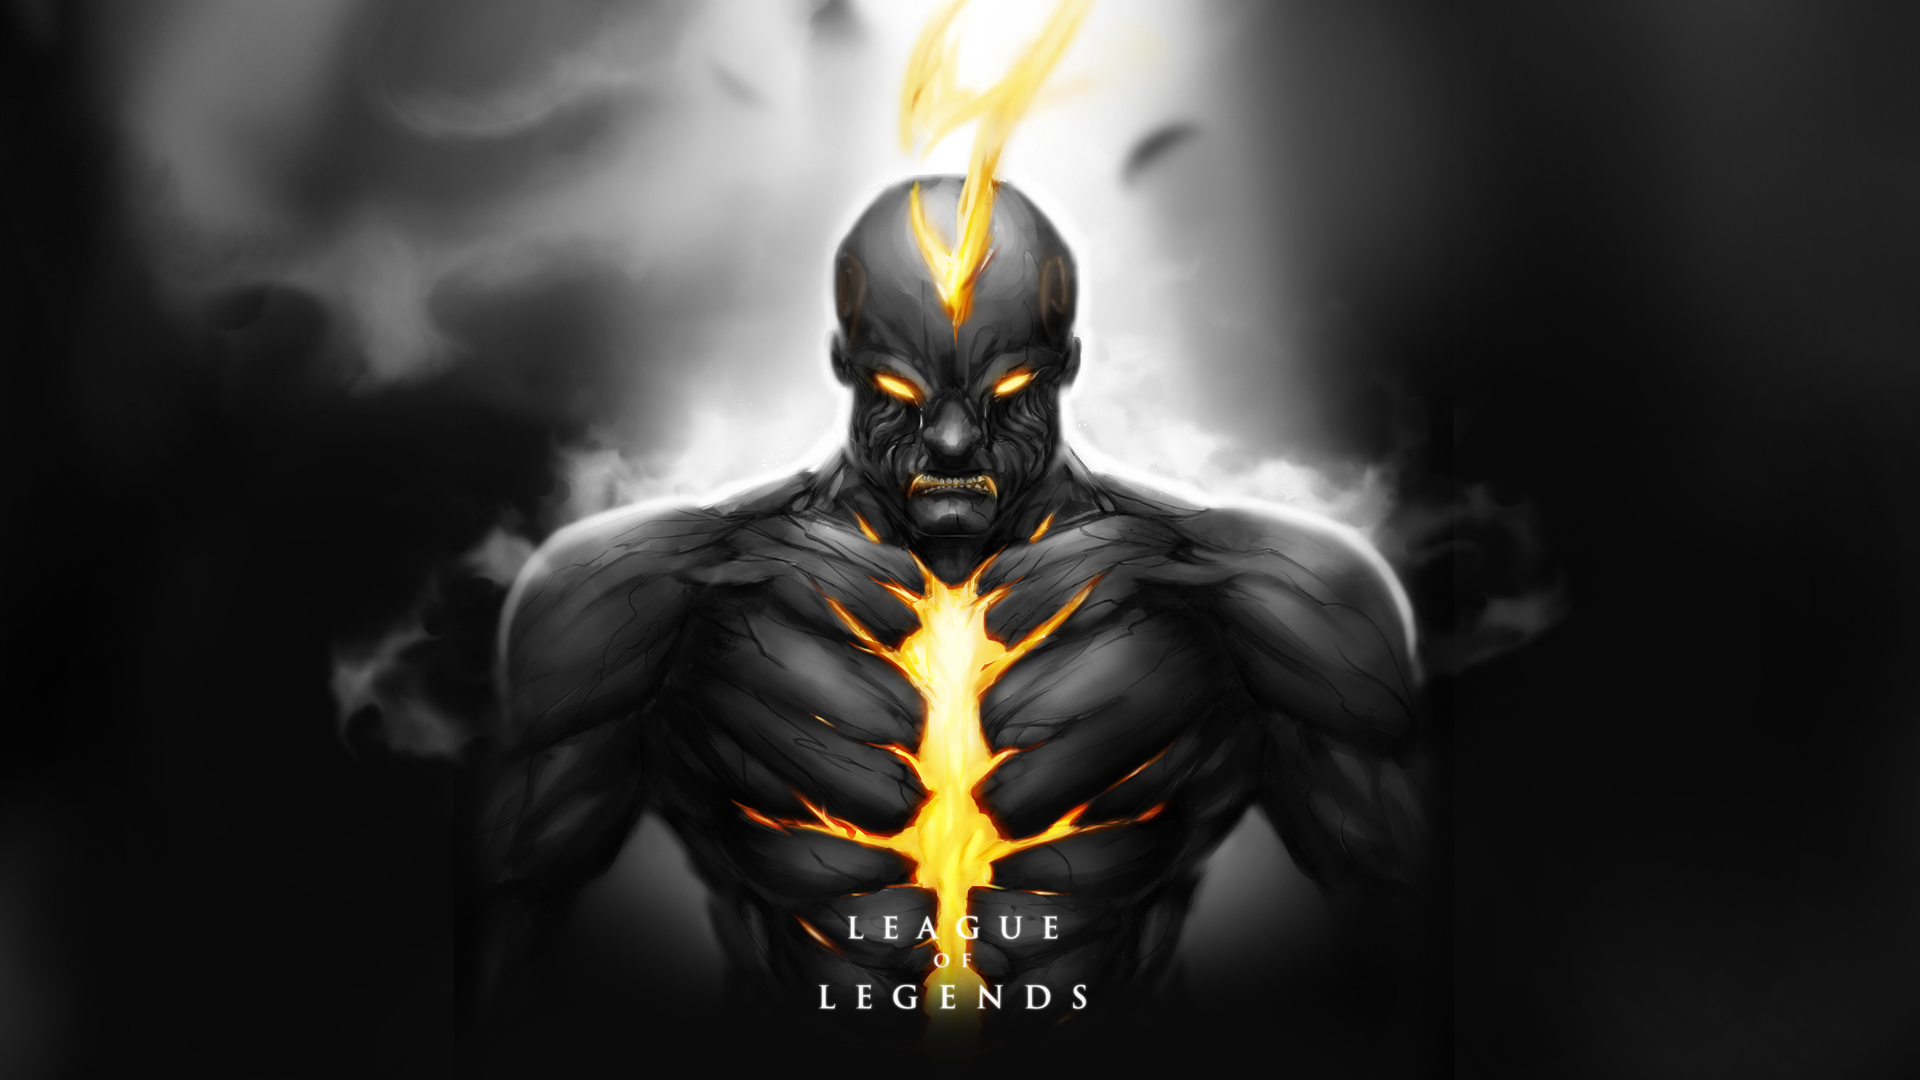 League of Legends wallpaper 95